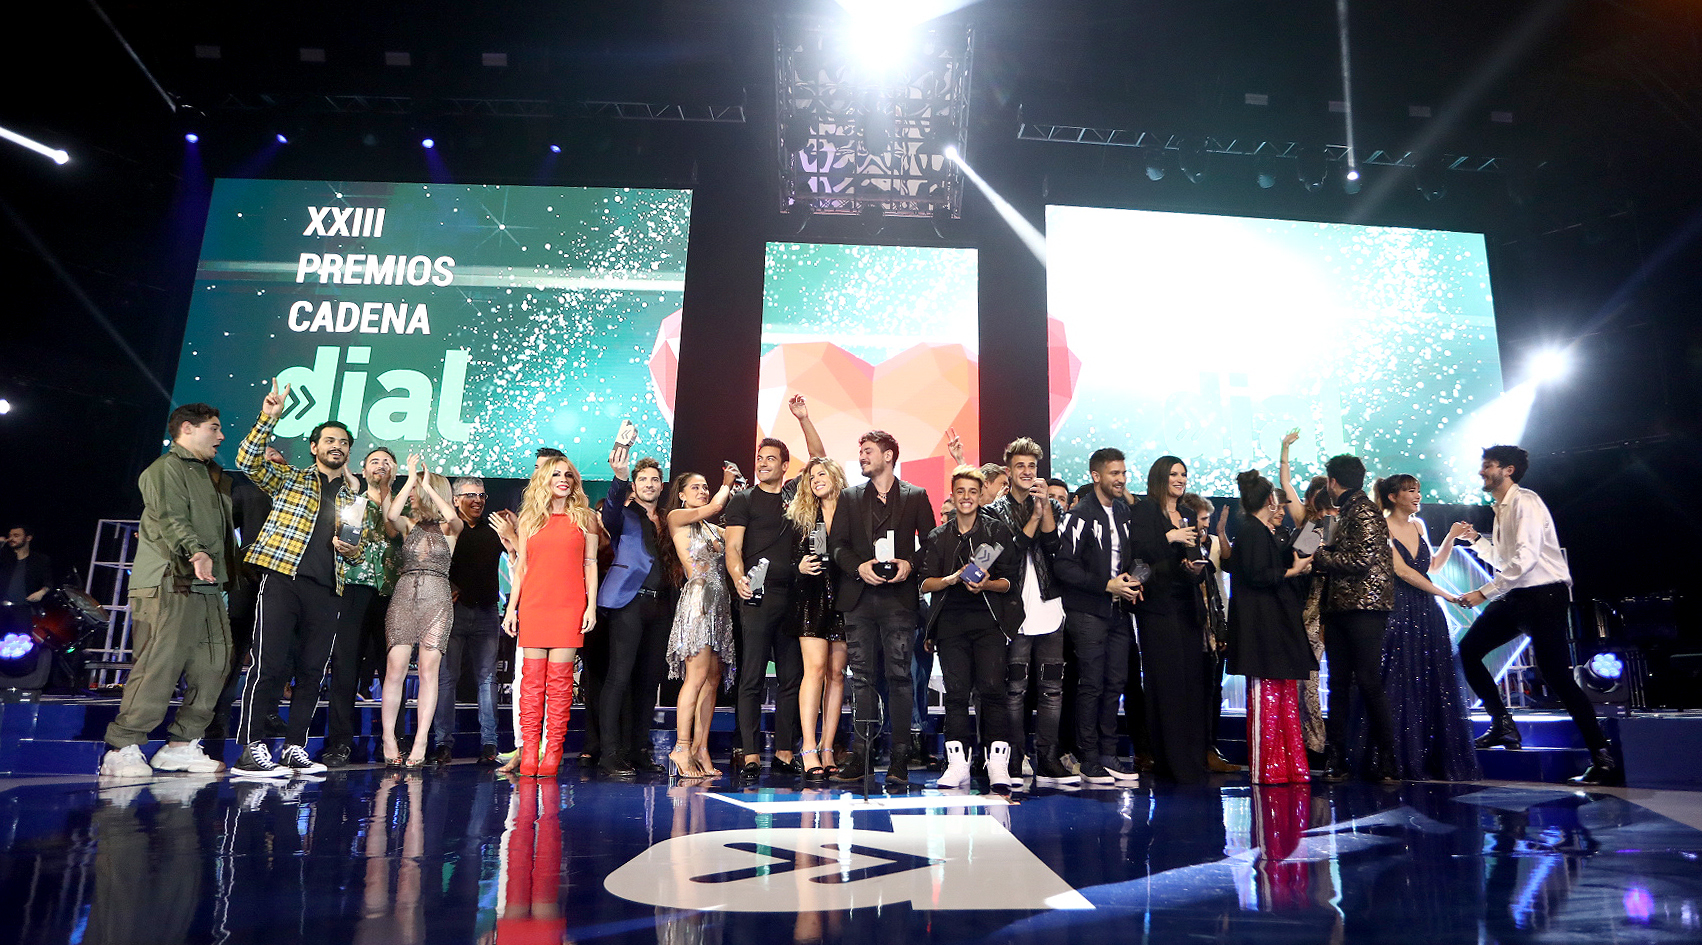 Foto de familia XXIII Premios Cadena Dial